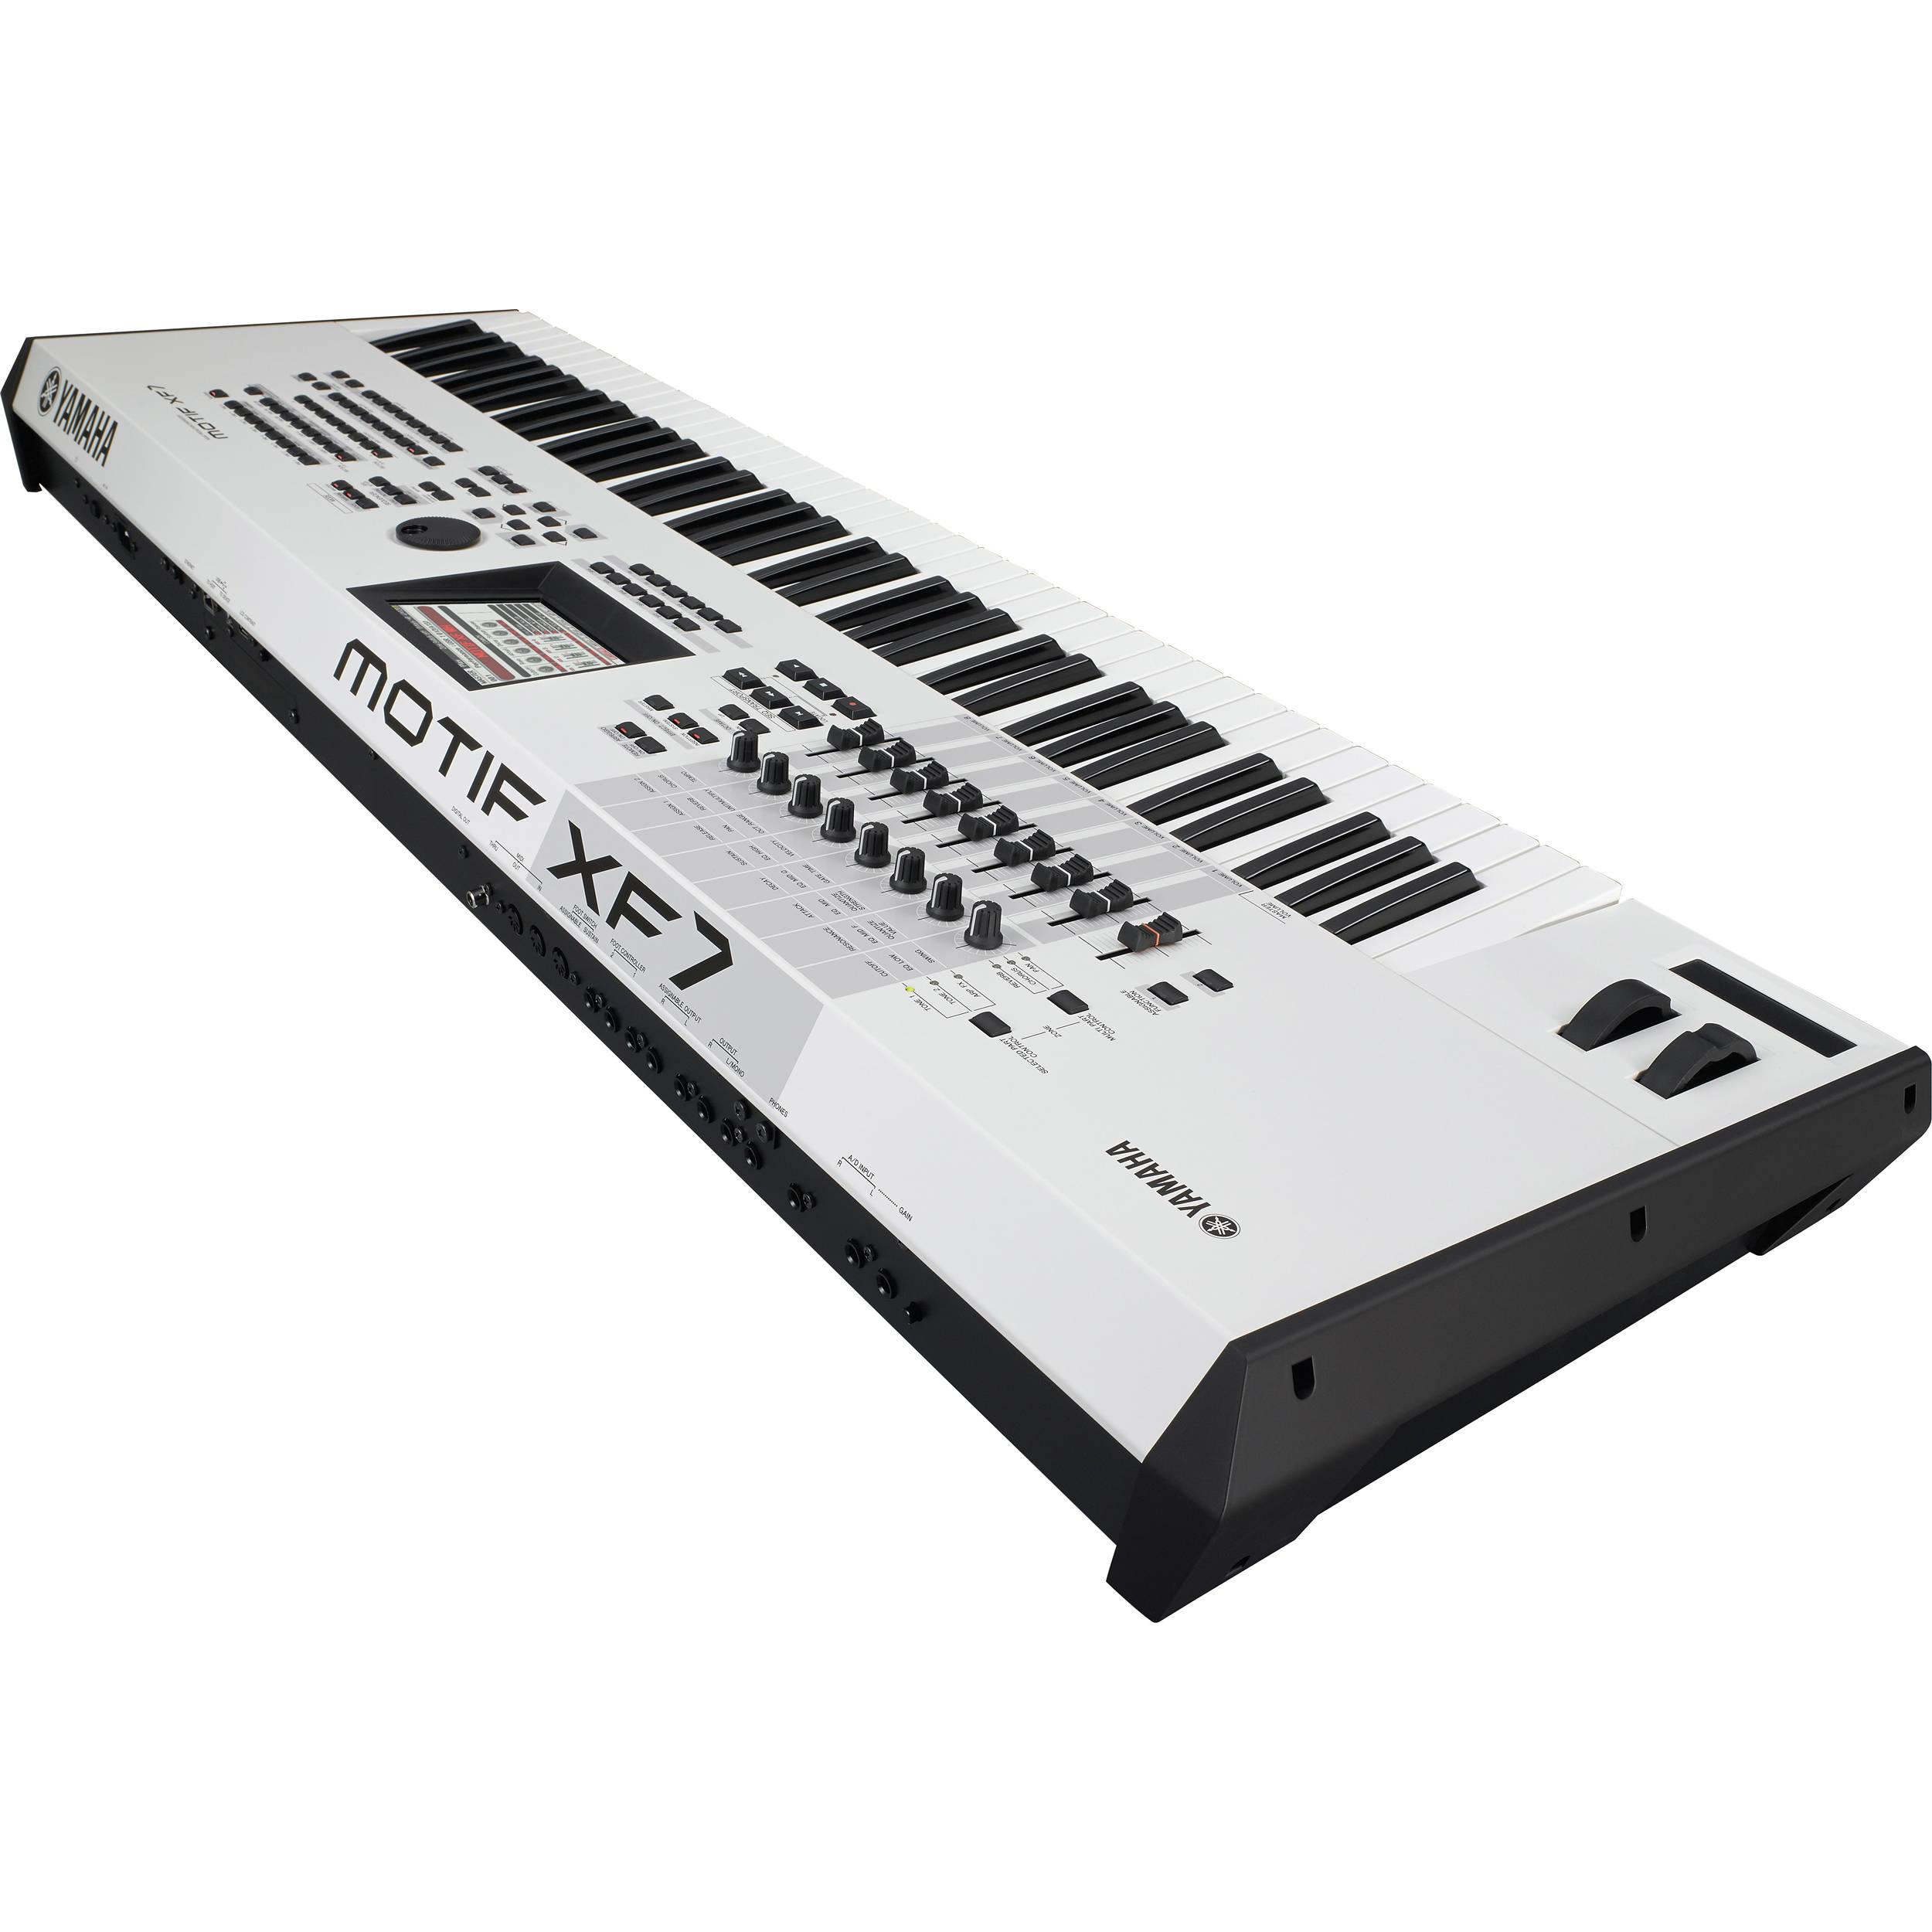 Yamaha motif xf7 wh workstation keyboard motifxf7 wh b h for Yamaha warranty registration